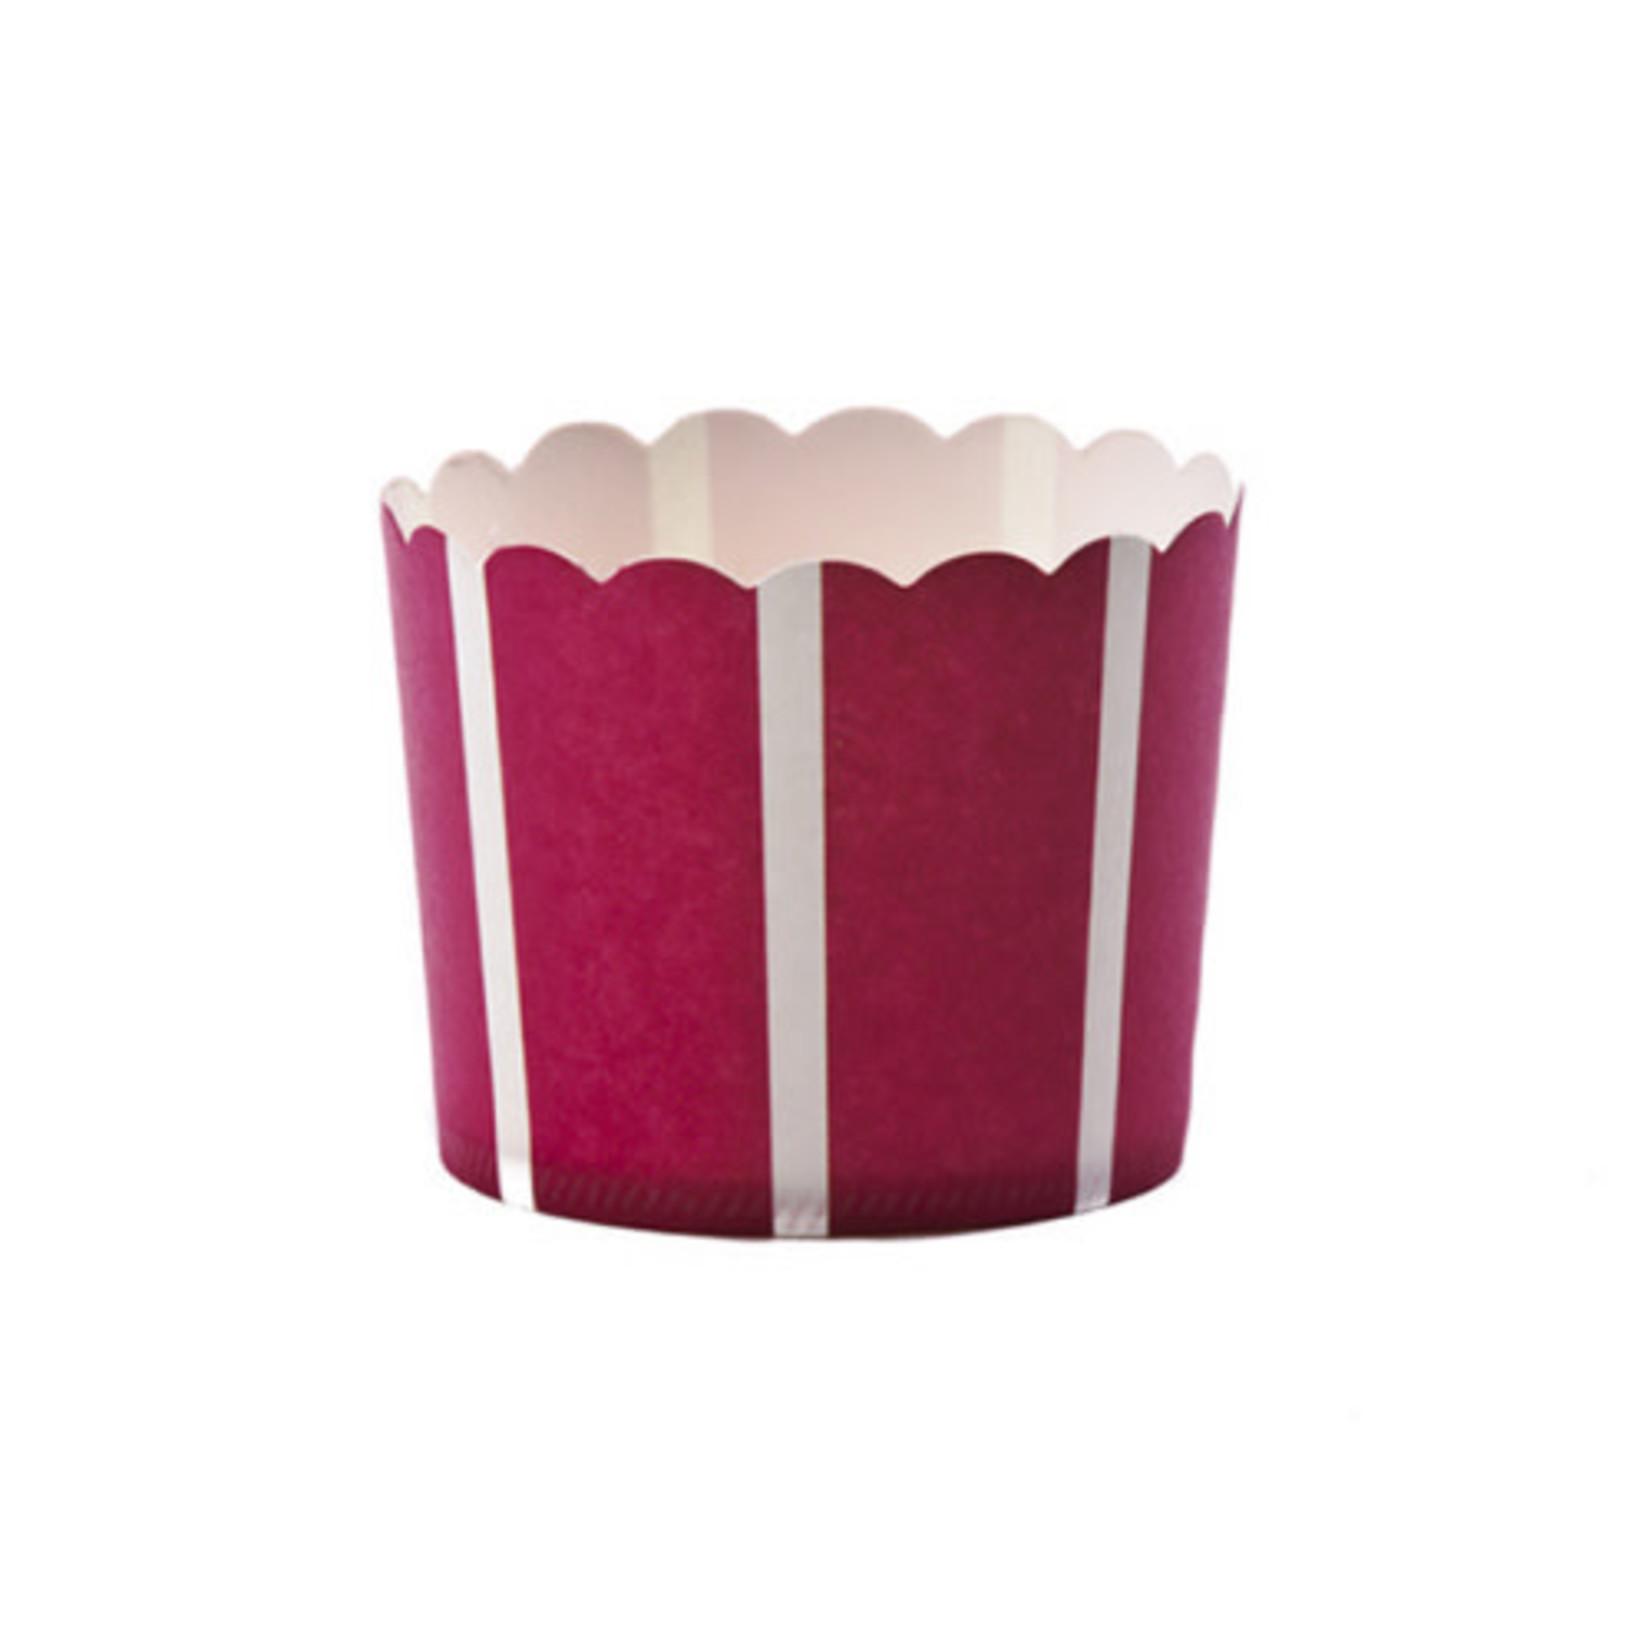 Large Scarlet Vertical/20PK Baking Cup